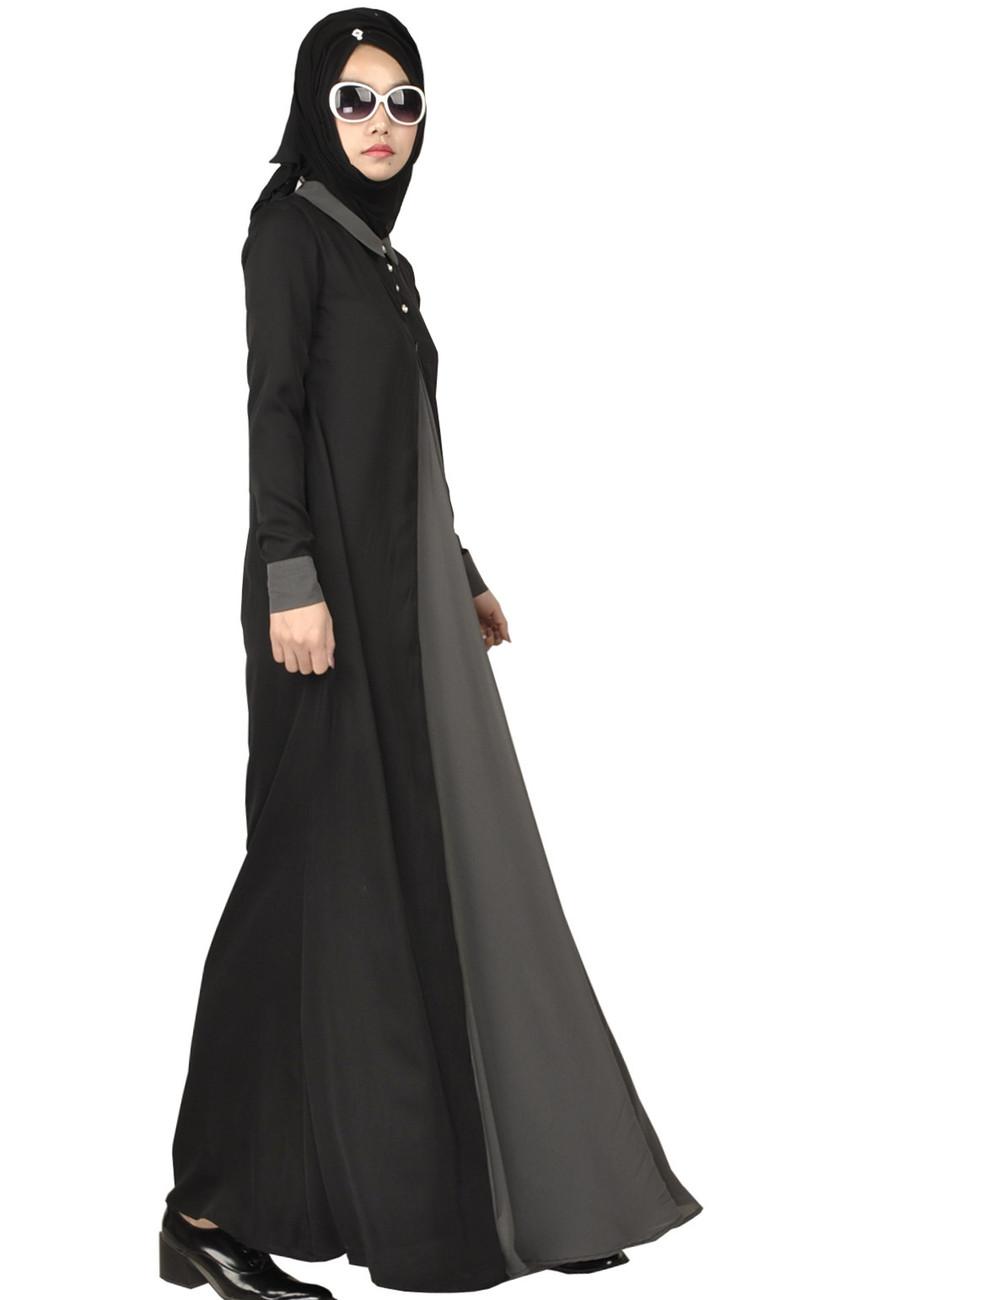 Longue robe Femmes Malaisie abayas Musulmanes